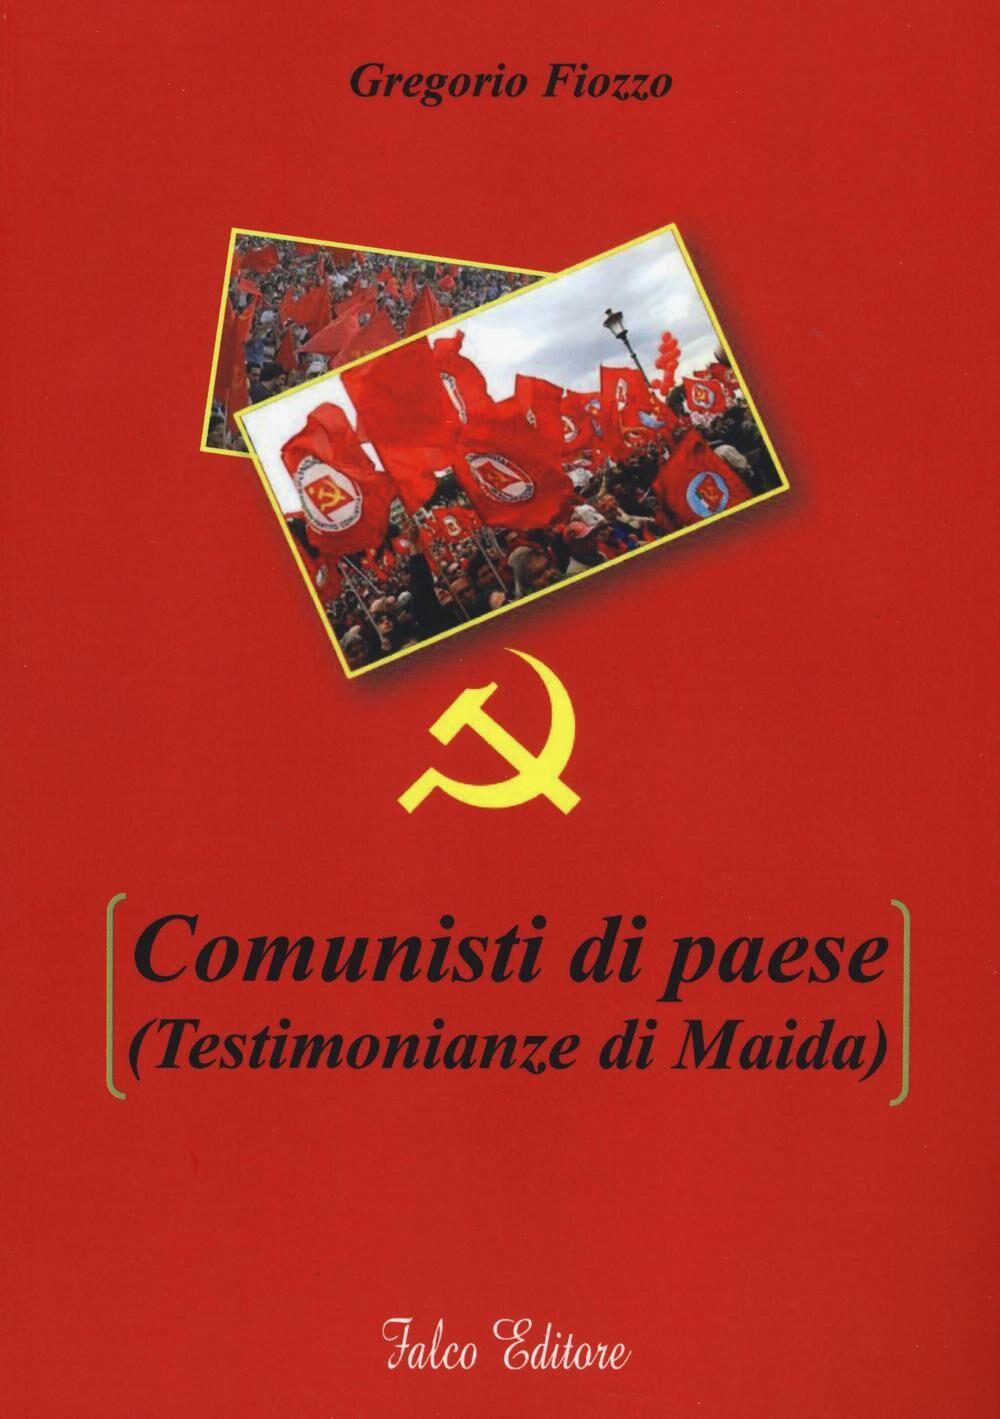 Comunisti di paese (testimonianze di Maida)